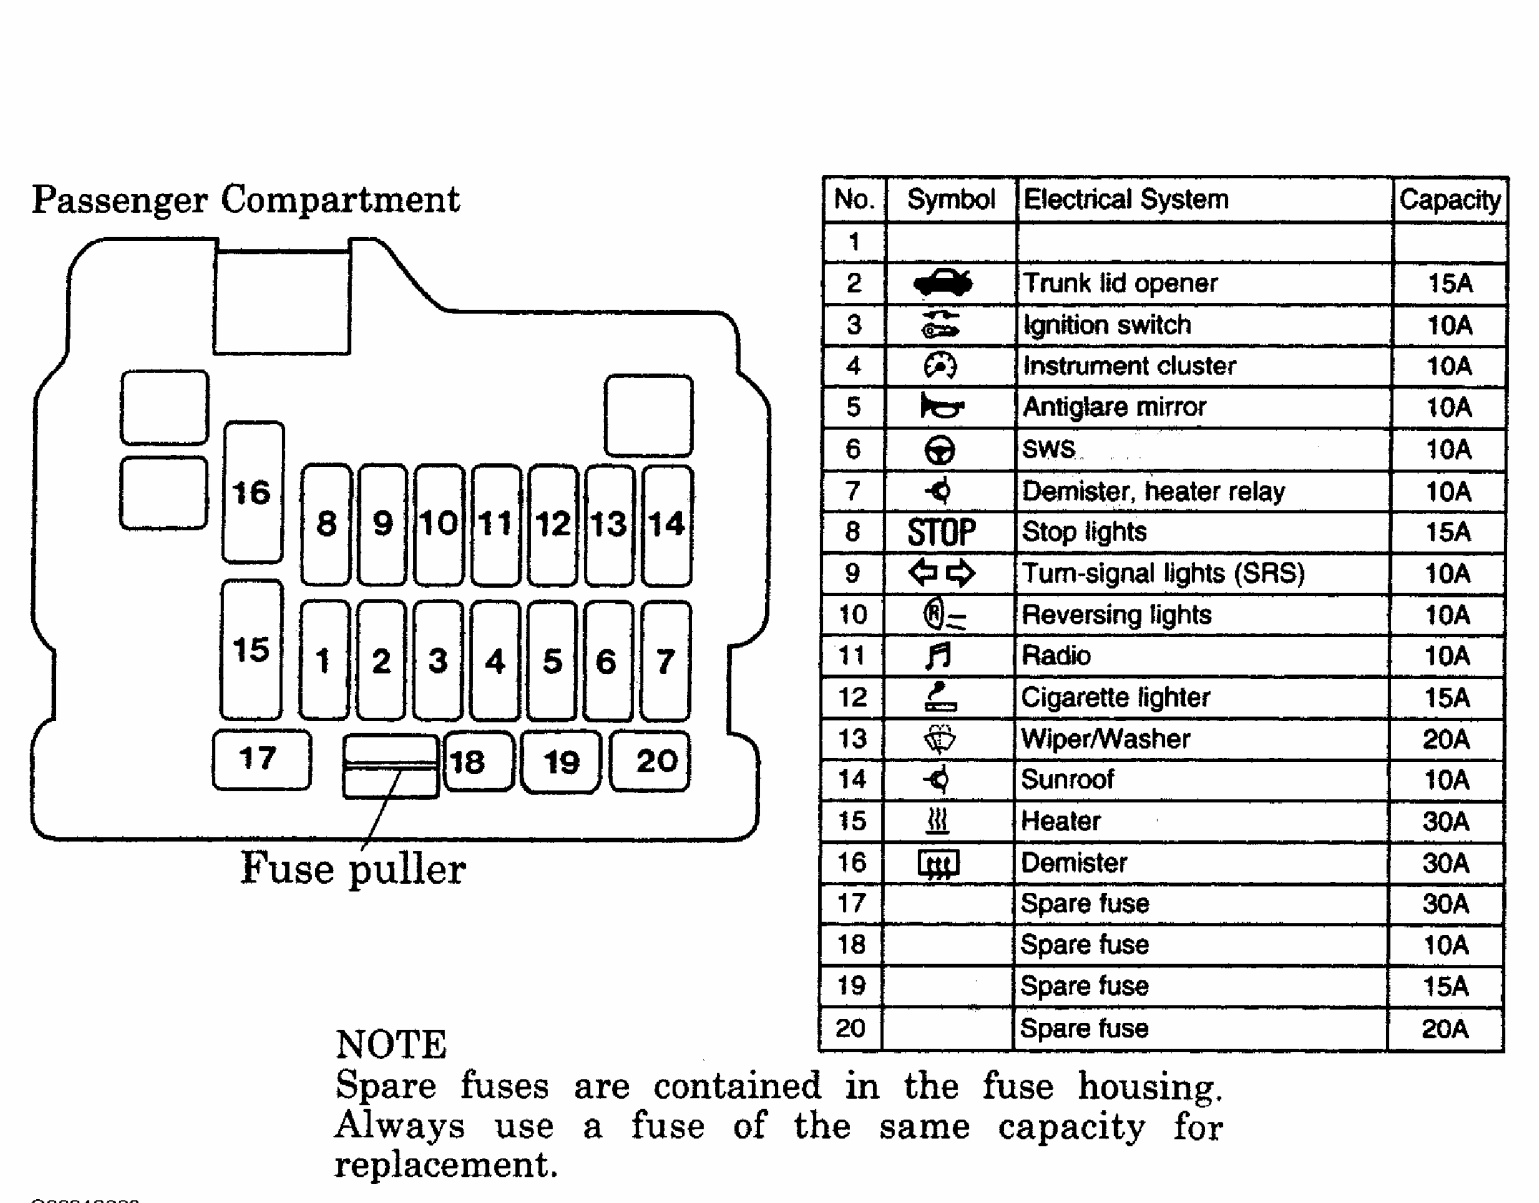 galant fuse box layout - wiring diagram export pen-suitcase -  pen-suitcase.congressosifo2018.it  congressosifo2018.it